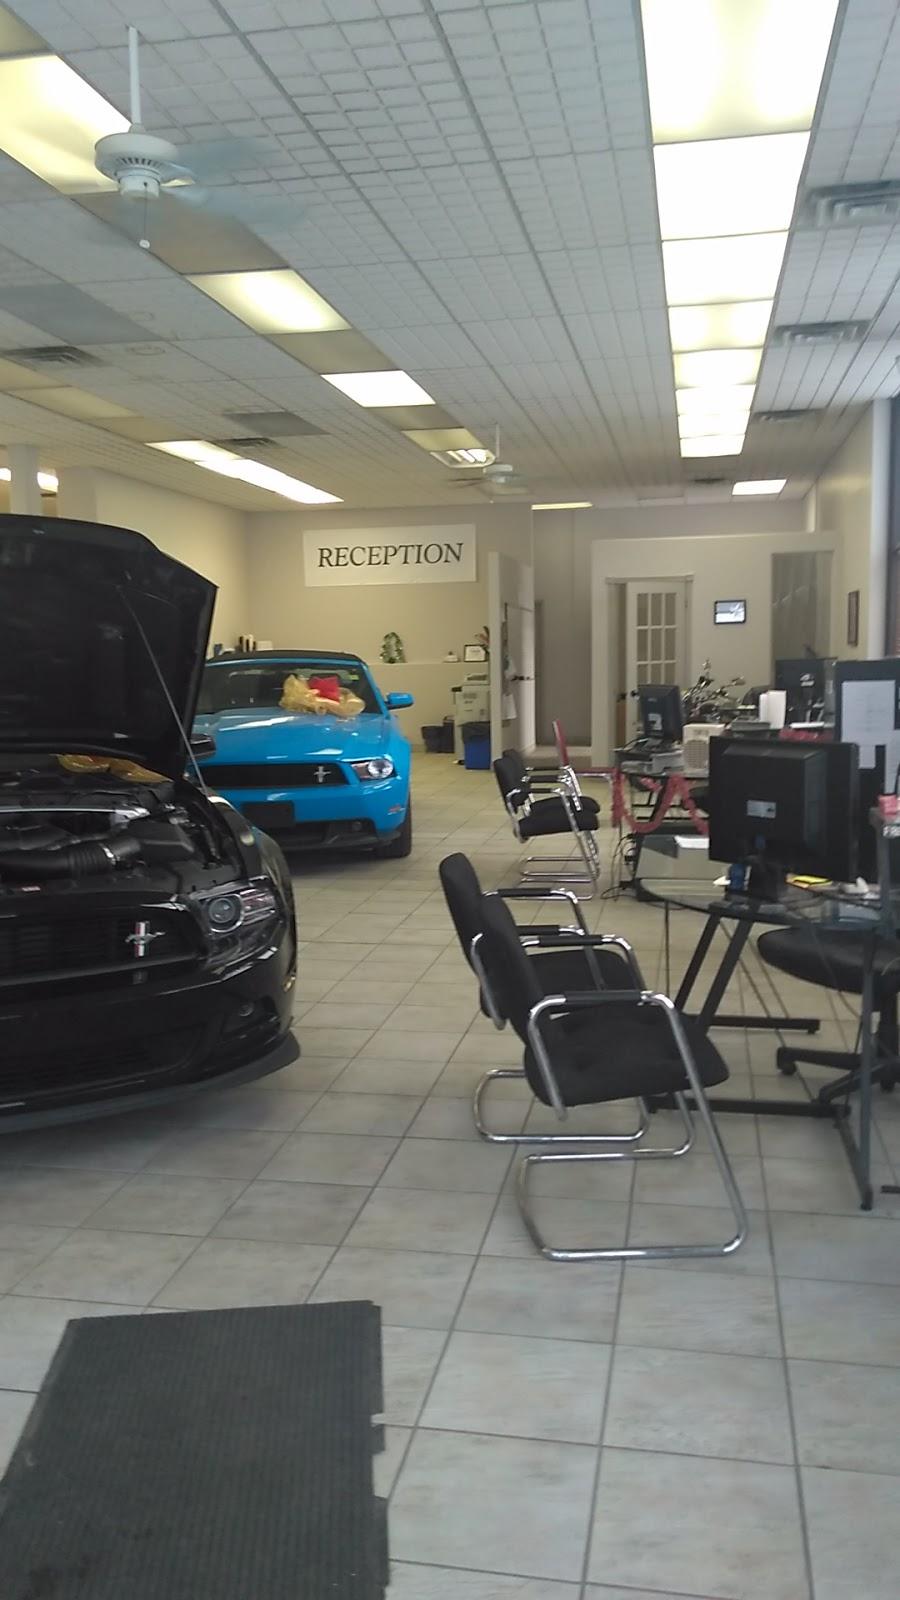 The Loan Arranger   car dealer   91 Essa Rd, Barrie, ON L4N 3K4, Canada   7057272003 OR +1 705-727-2003